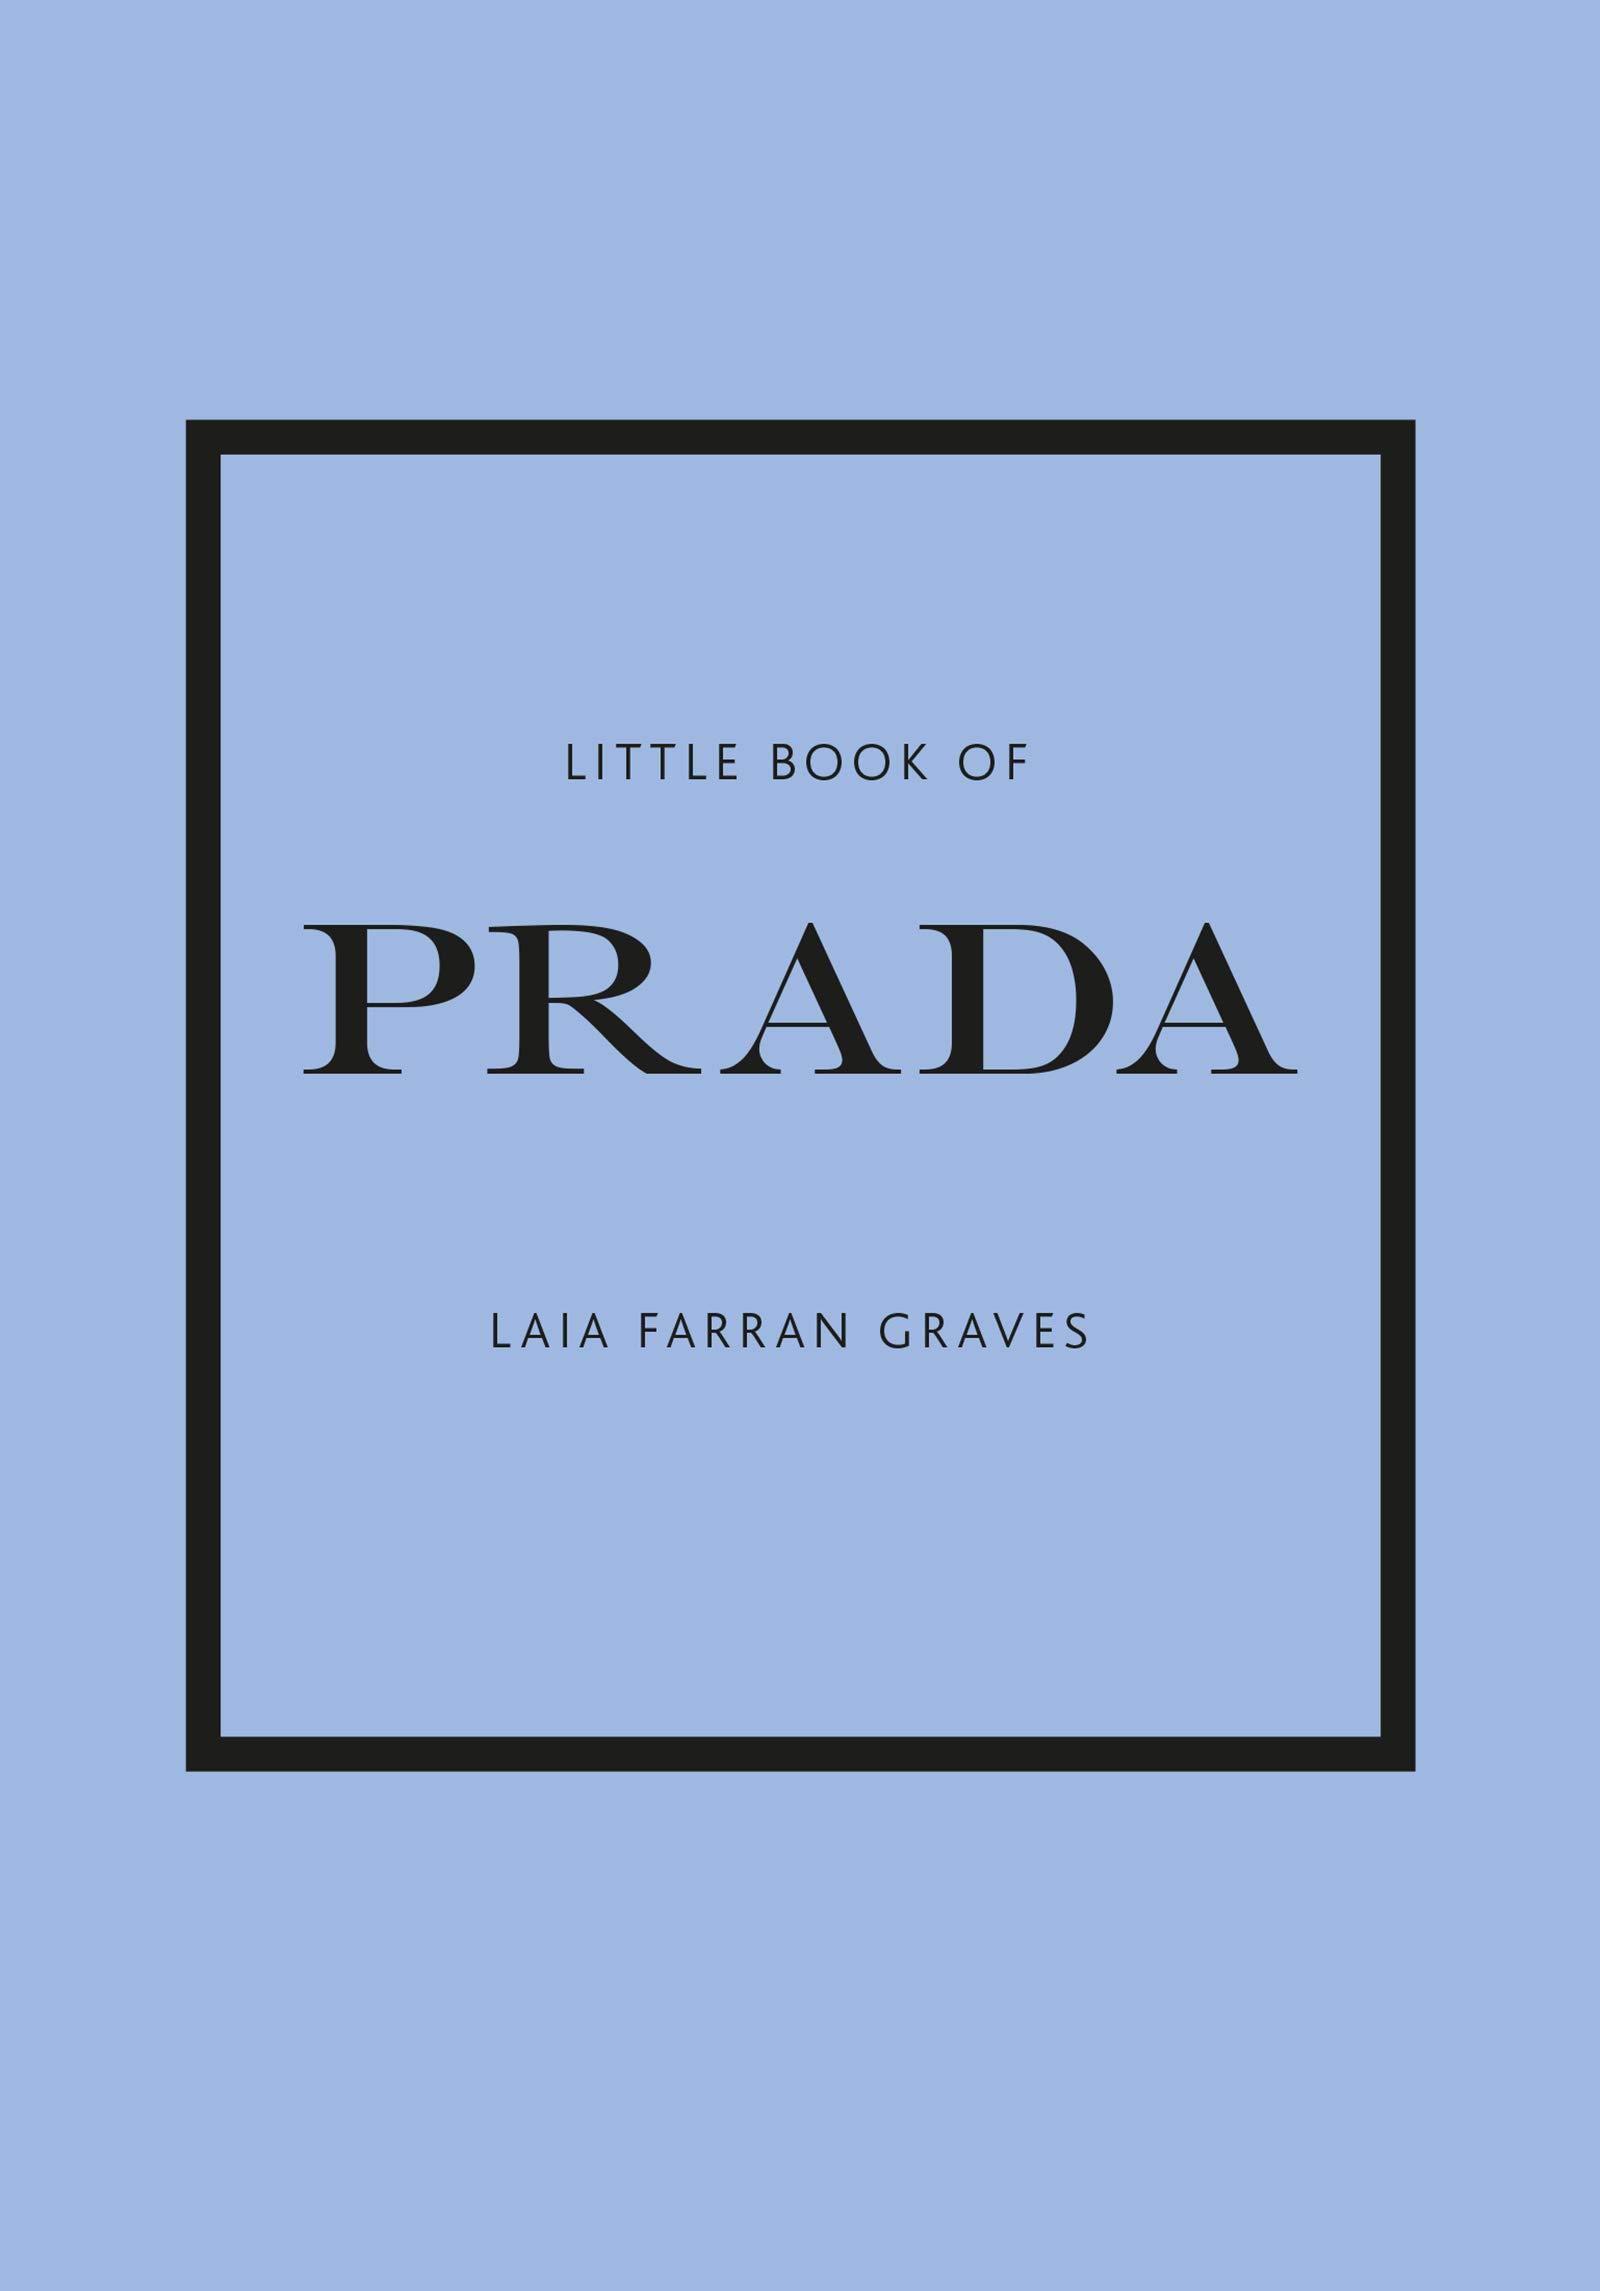 sách thời trang Little Book of Prada